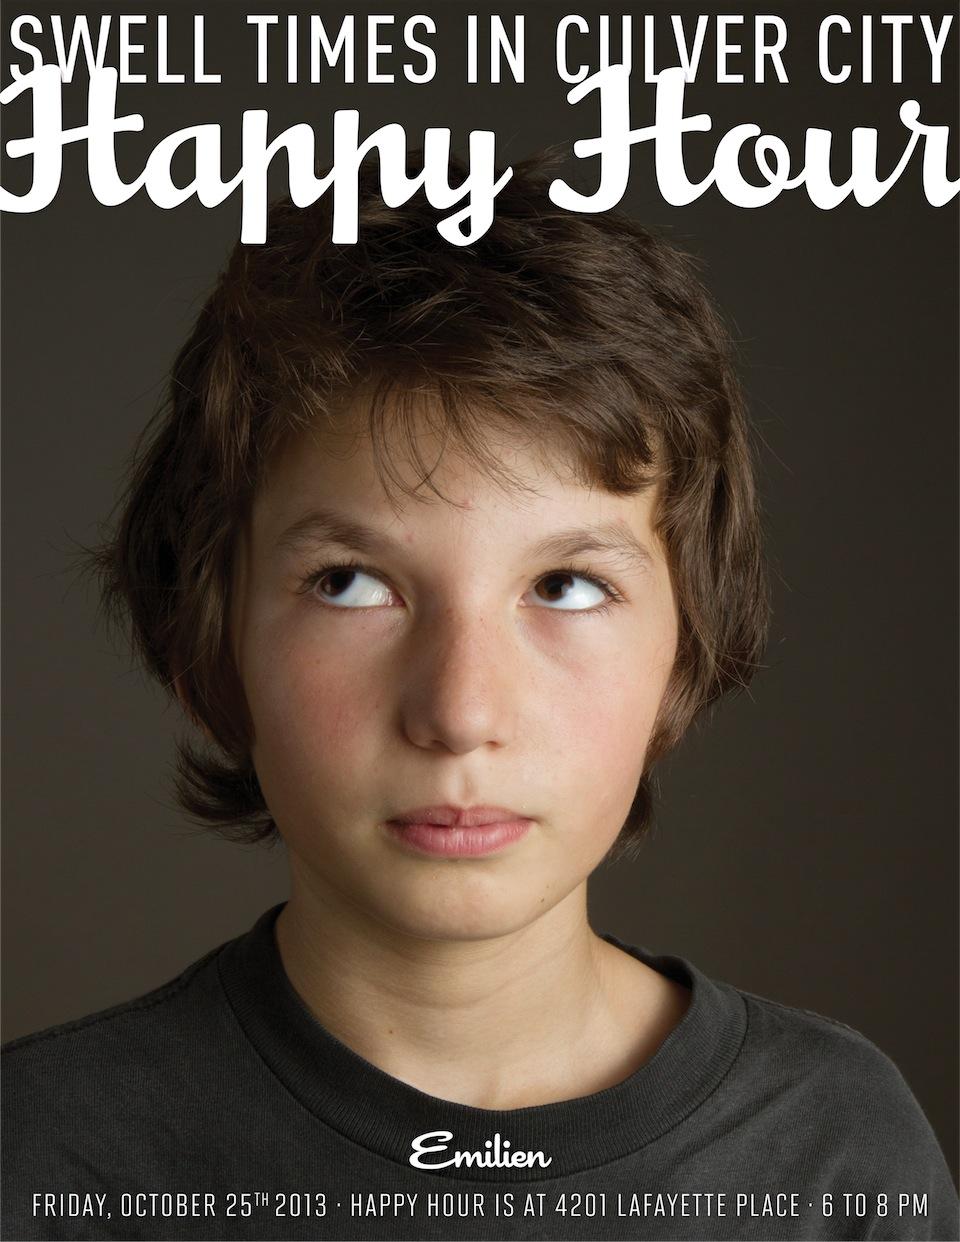 HappyHour_KidsPortraits_2013_10_24__23h30-1.jpg